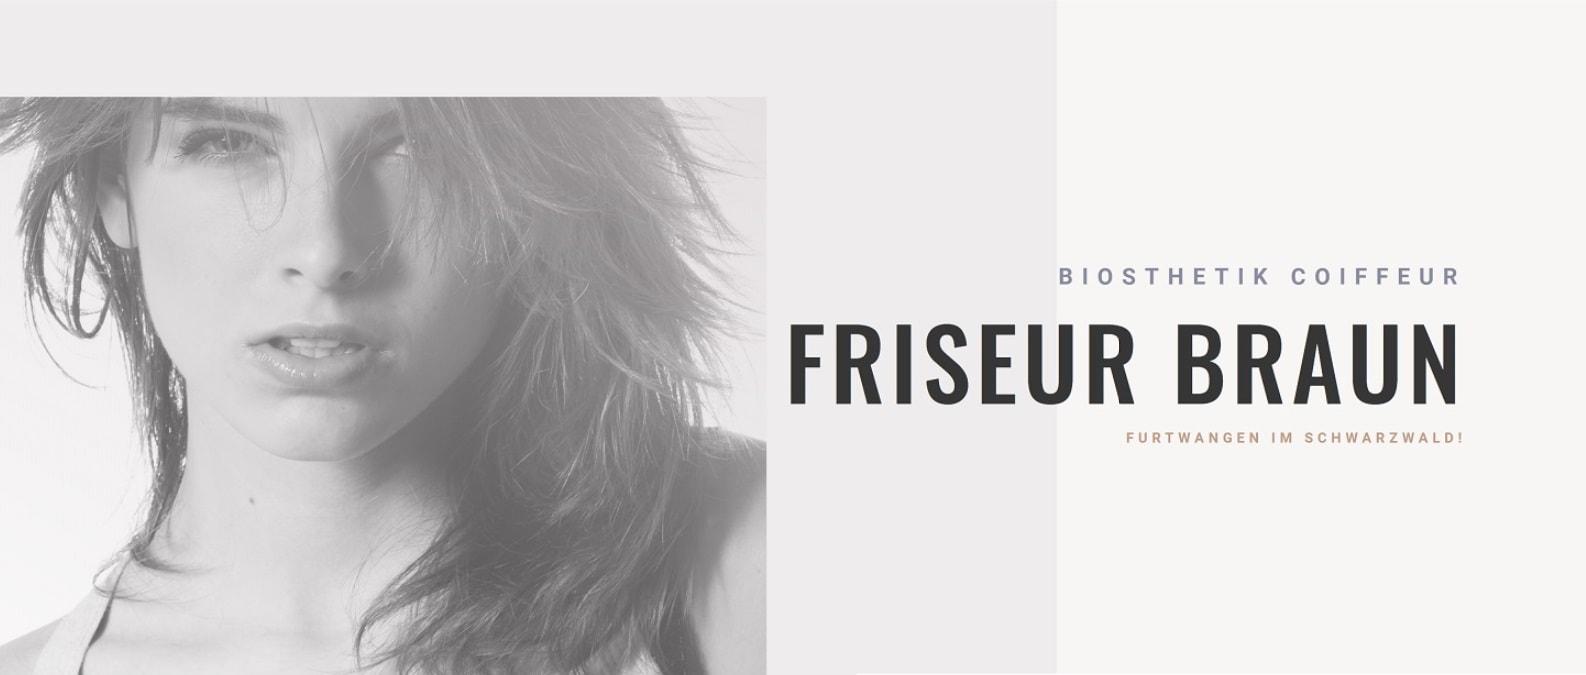 Neue Website – Friseur Braun Furtwangen